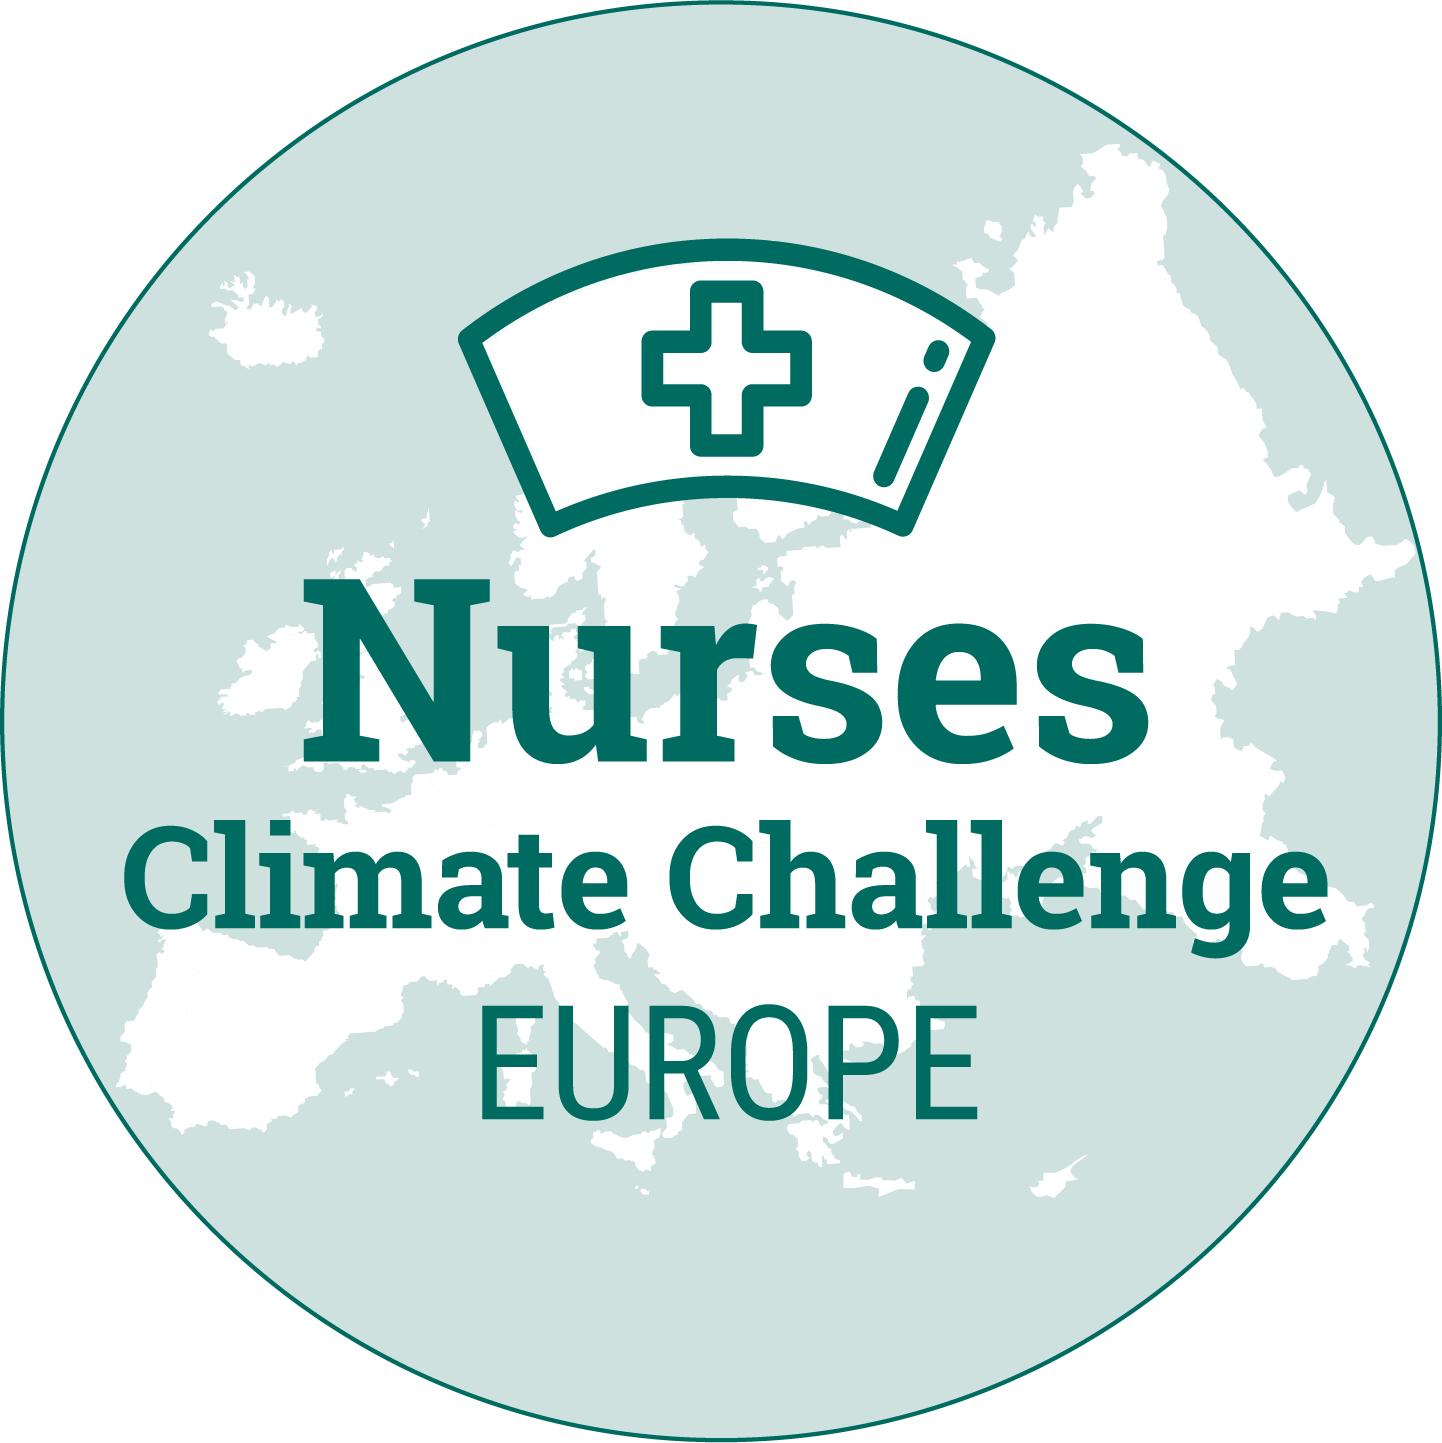 Nurses Climate Challenge Europe logo